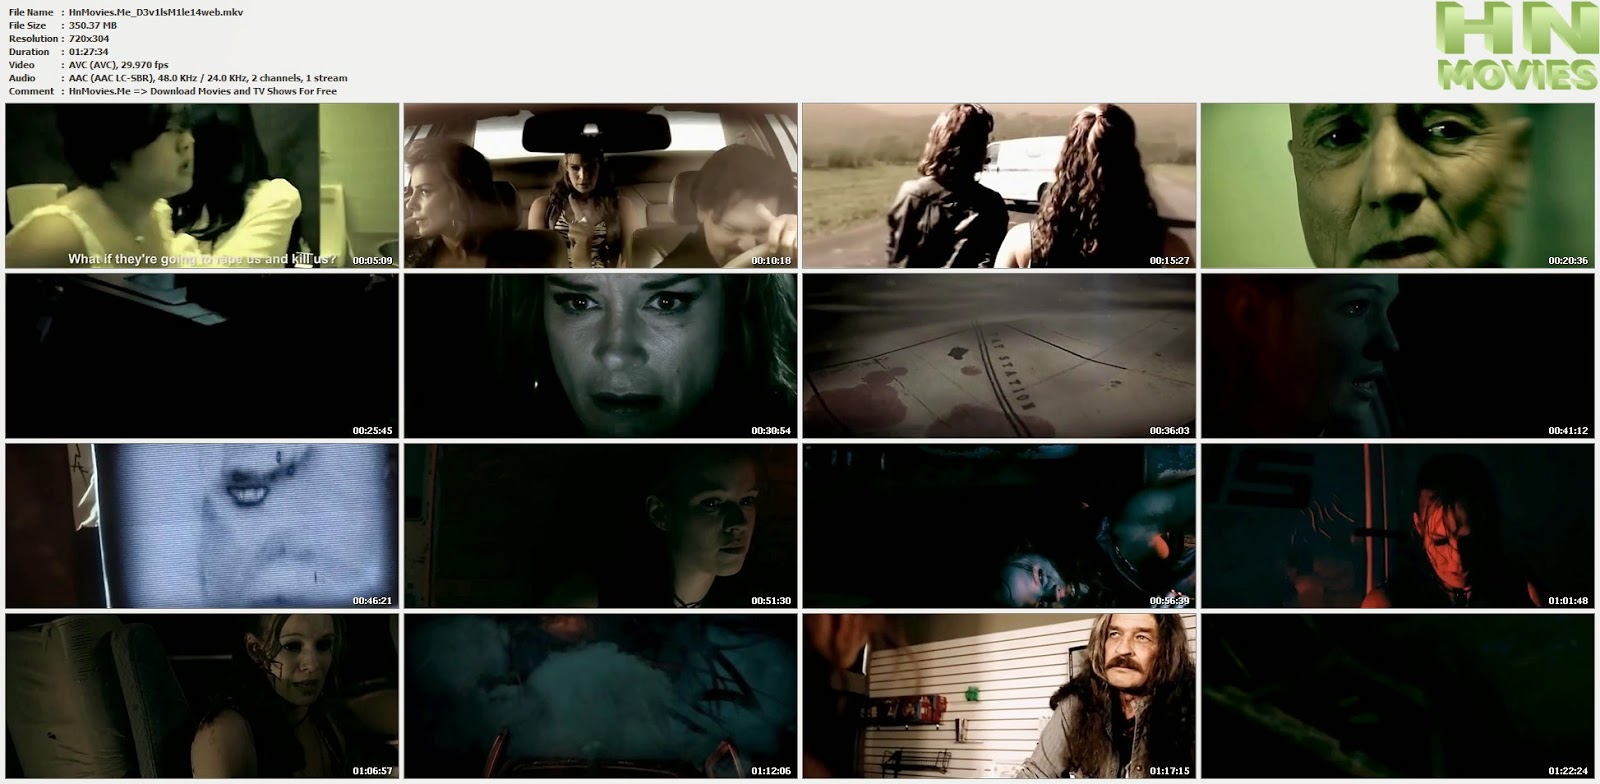 movie screenshot of Devil's Mile fdmovie.com